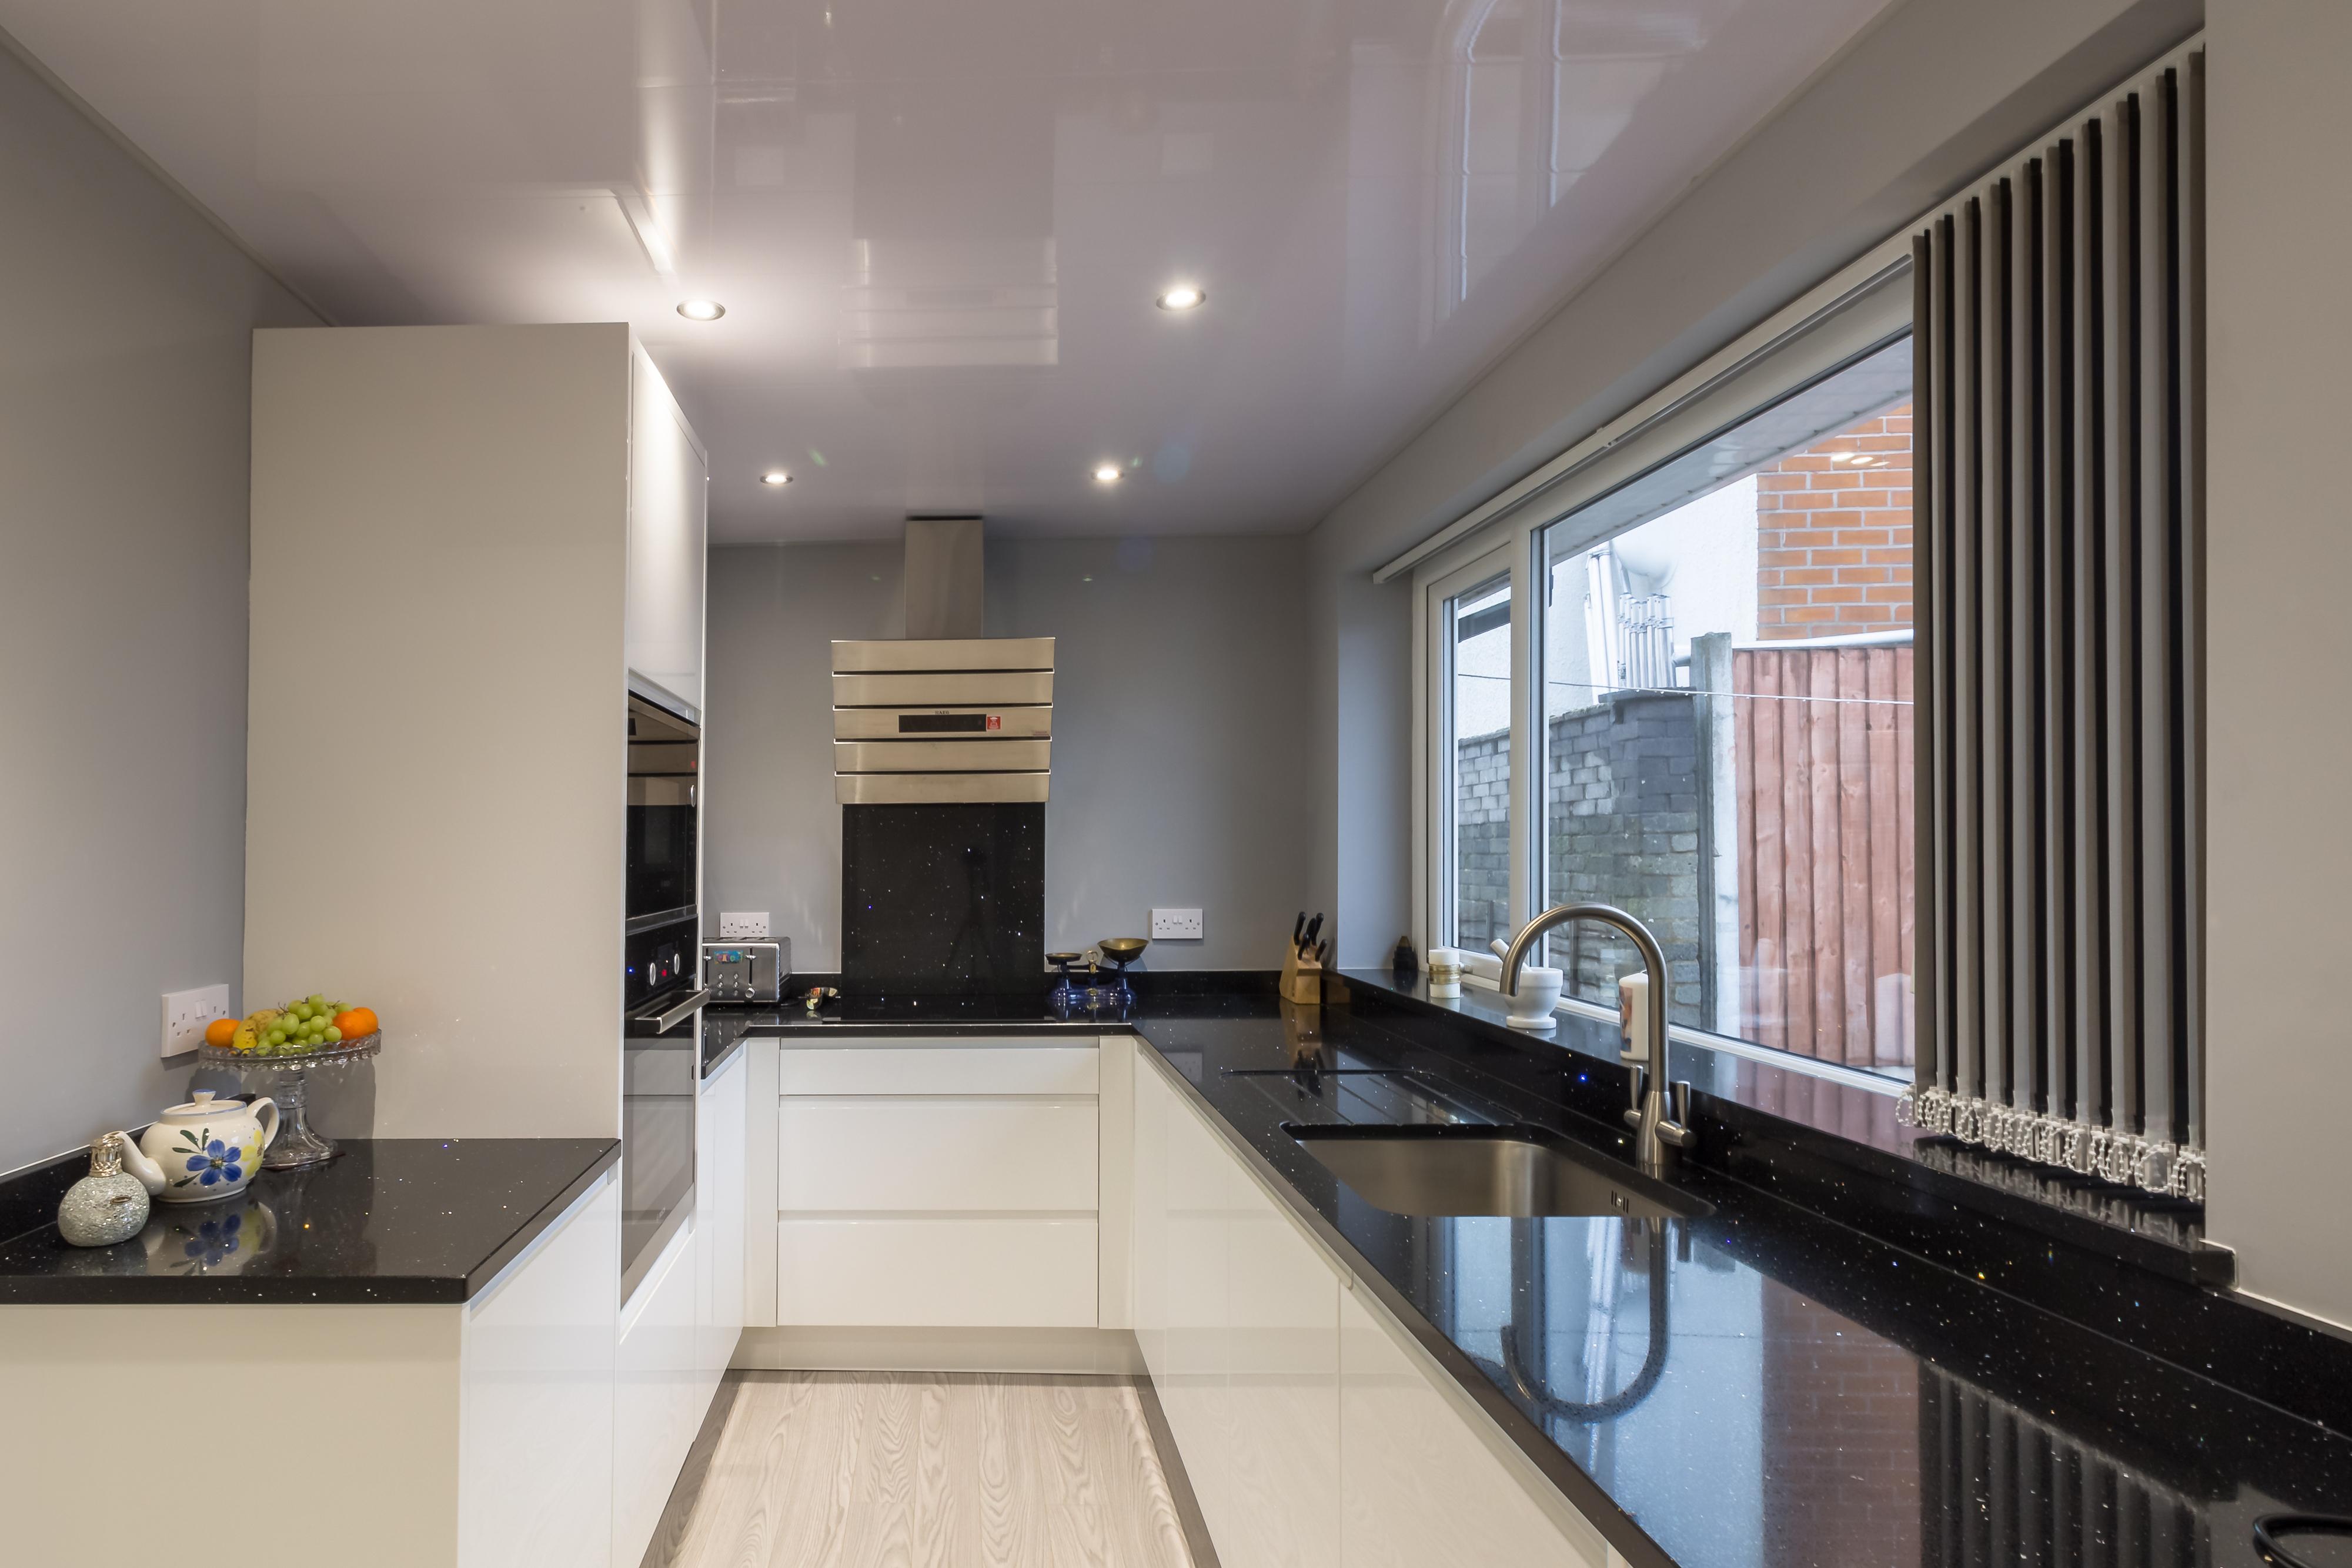 Mrs B, Milnrow - Eurostyle Kitchens of Rochdale